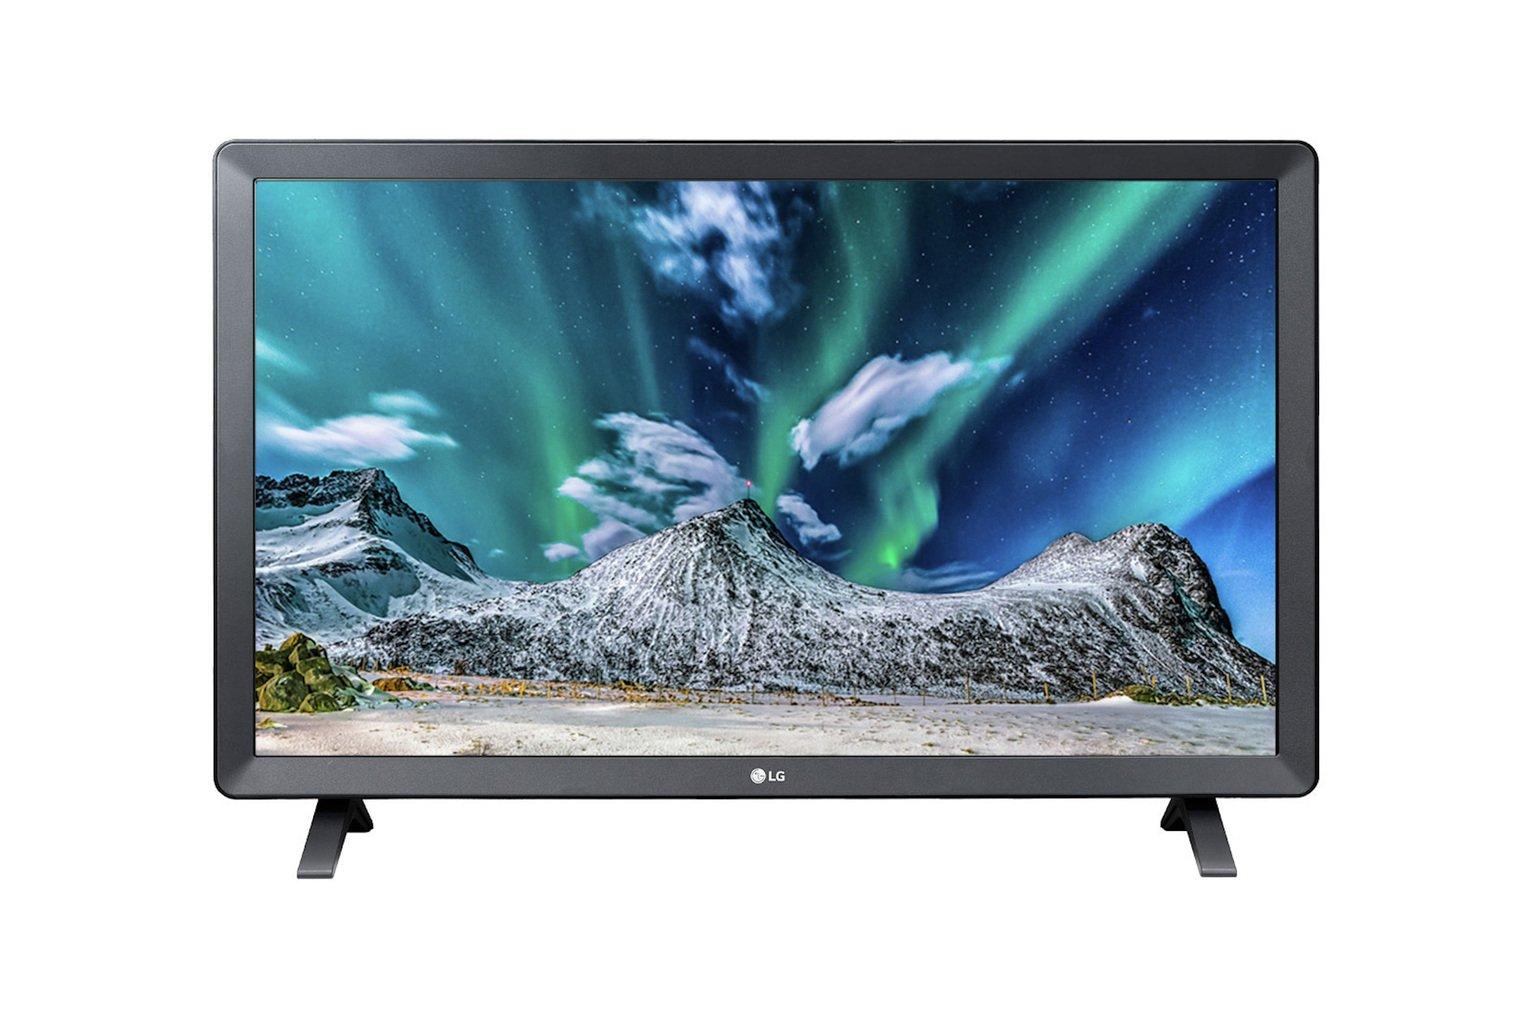 LG 24 Inch 24TL520S Smart HD Ready TV